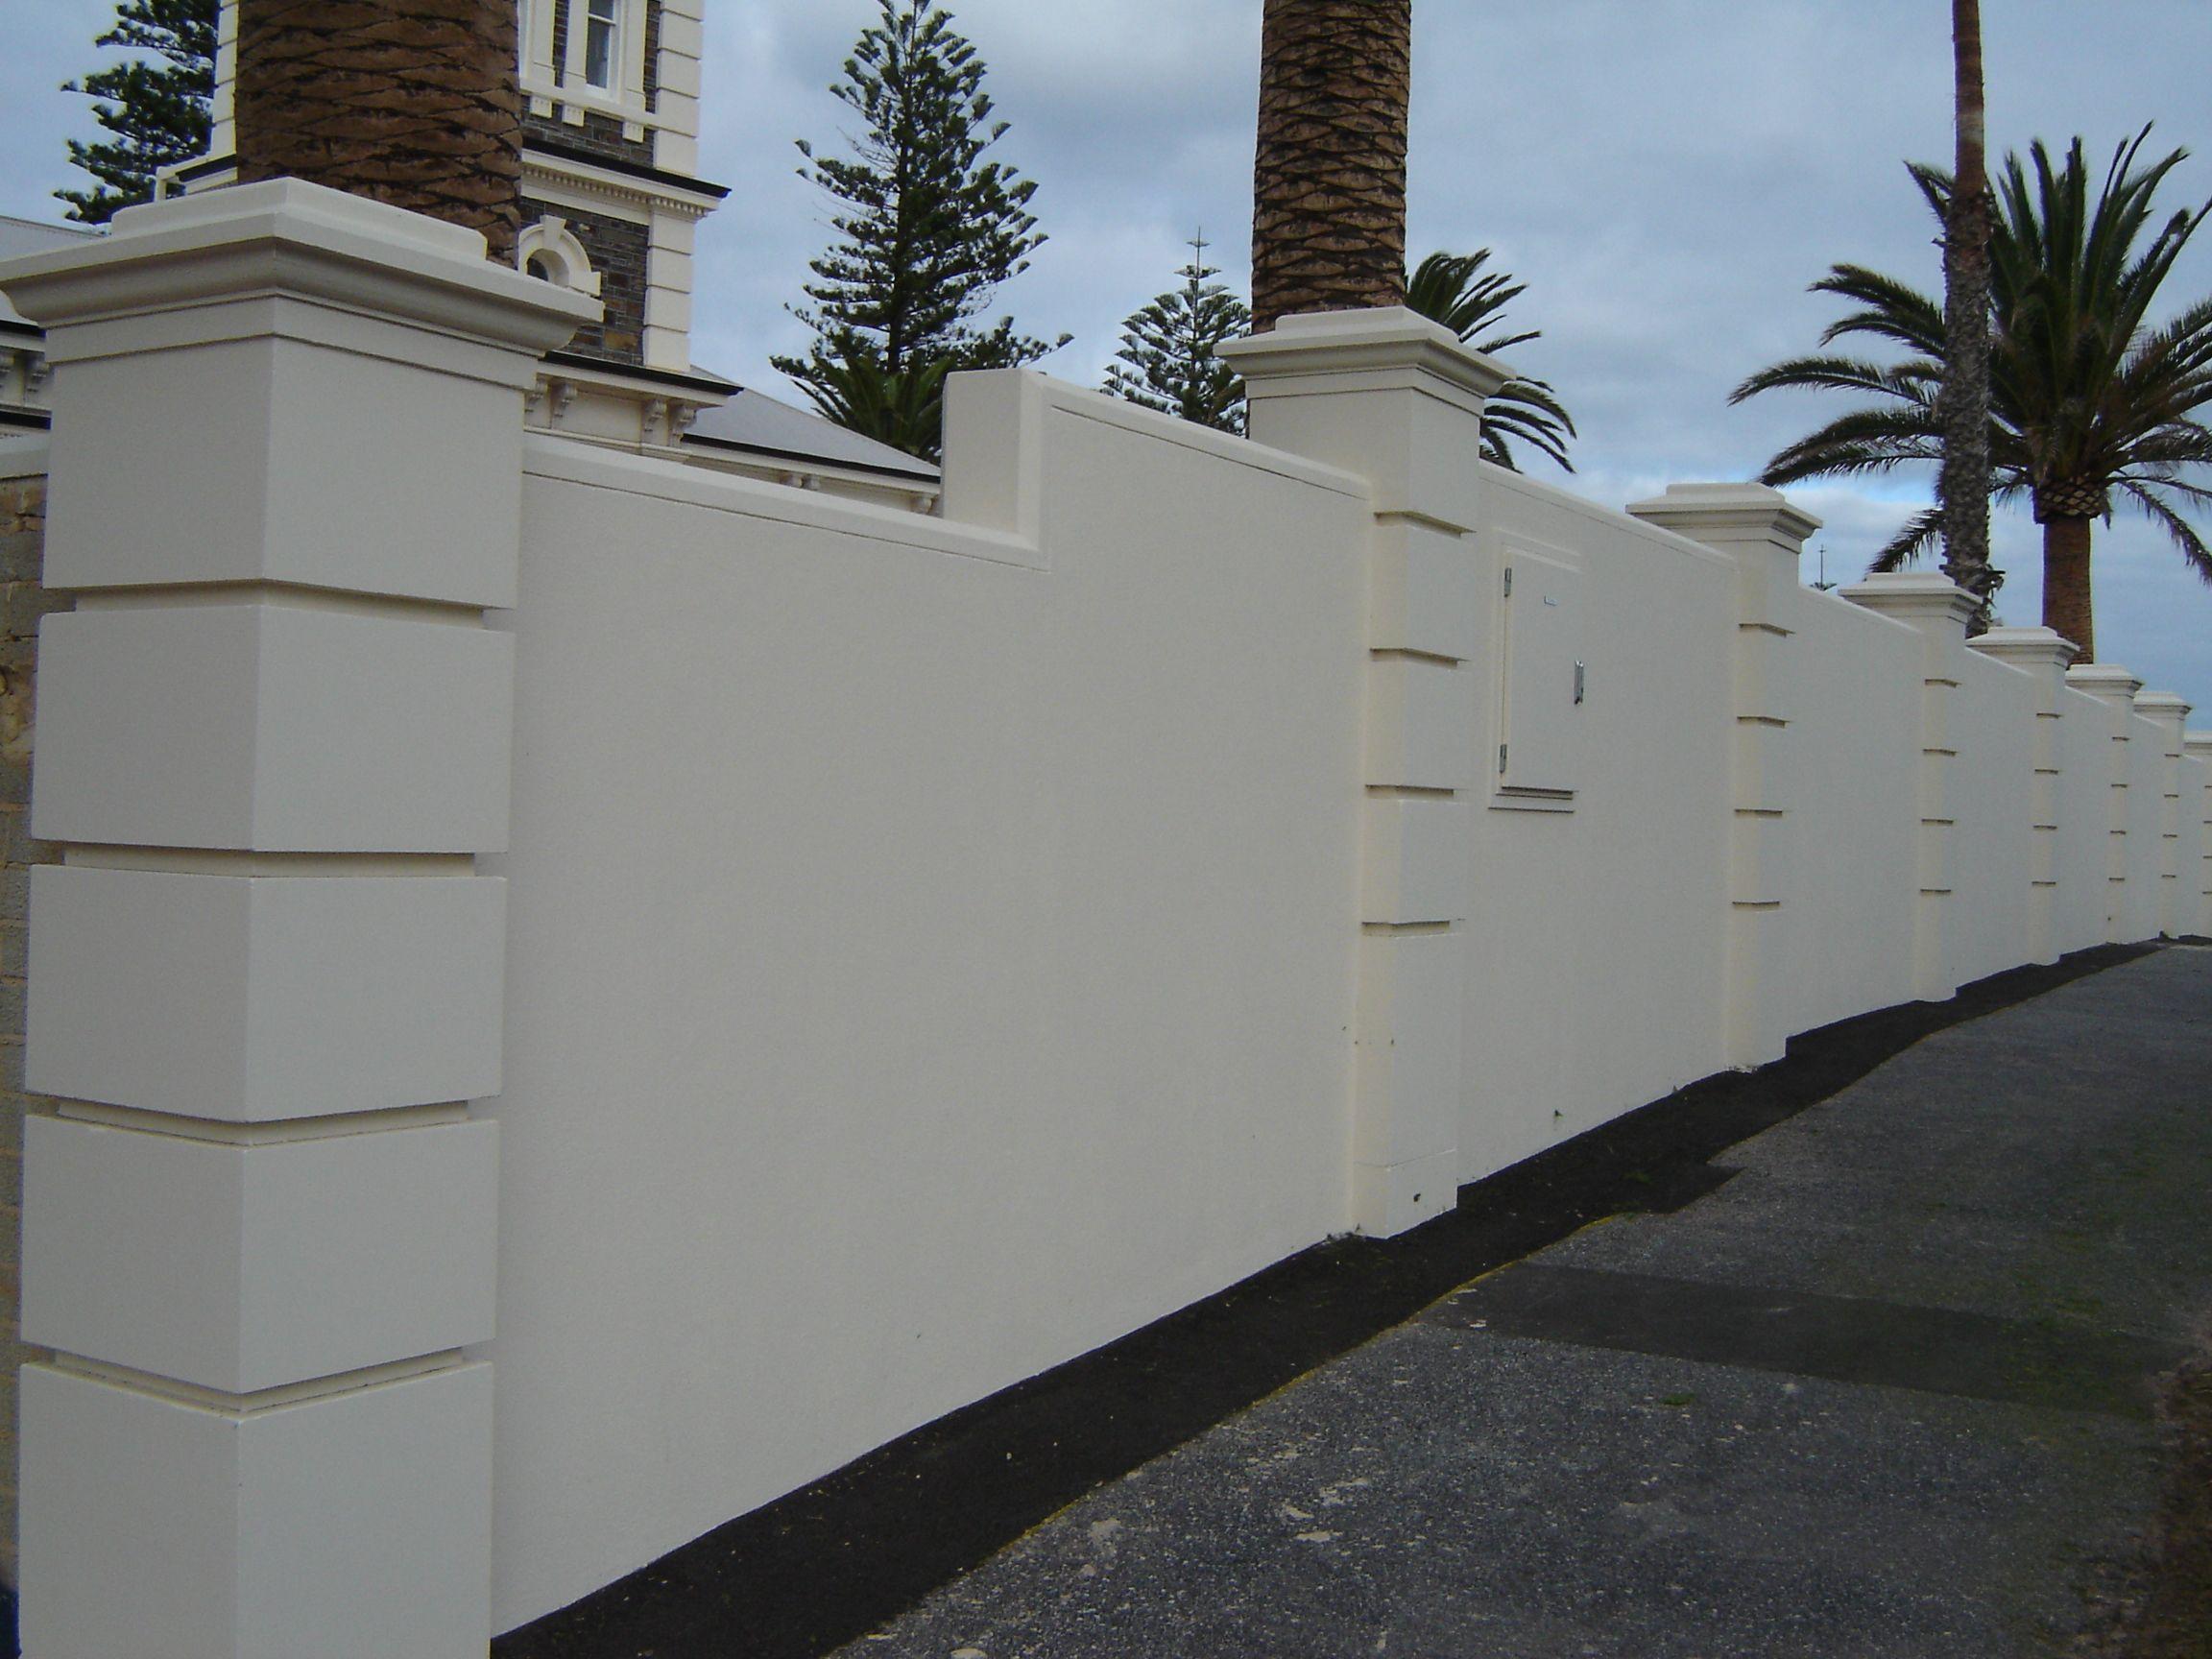 brick wall fence design ideas - Google Search   House ...